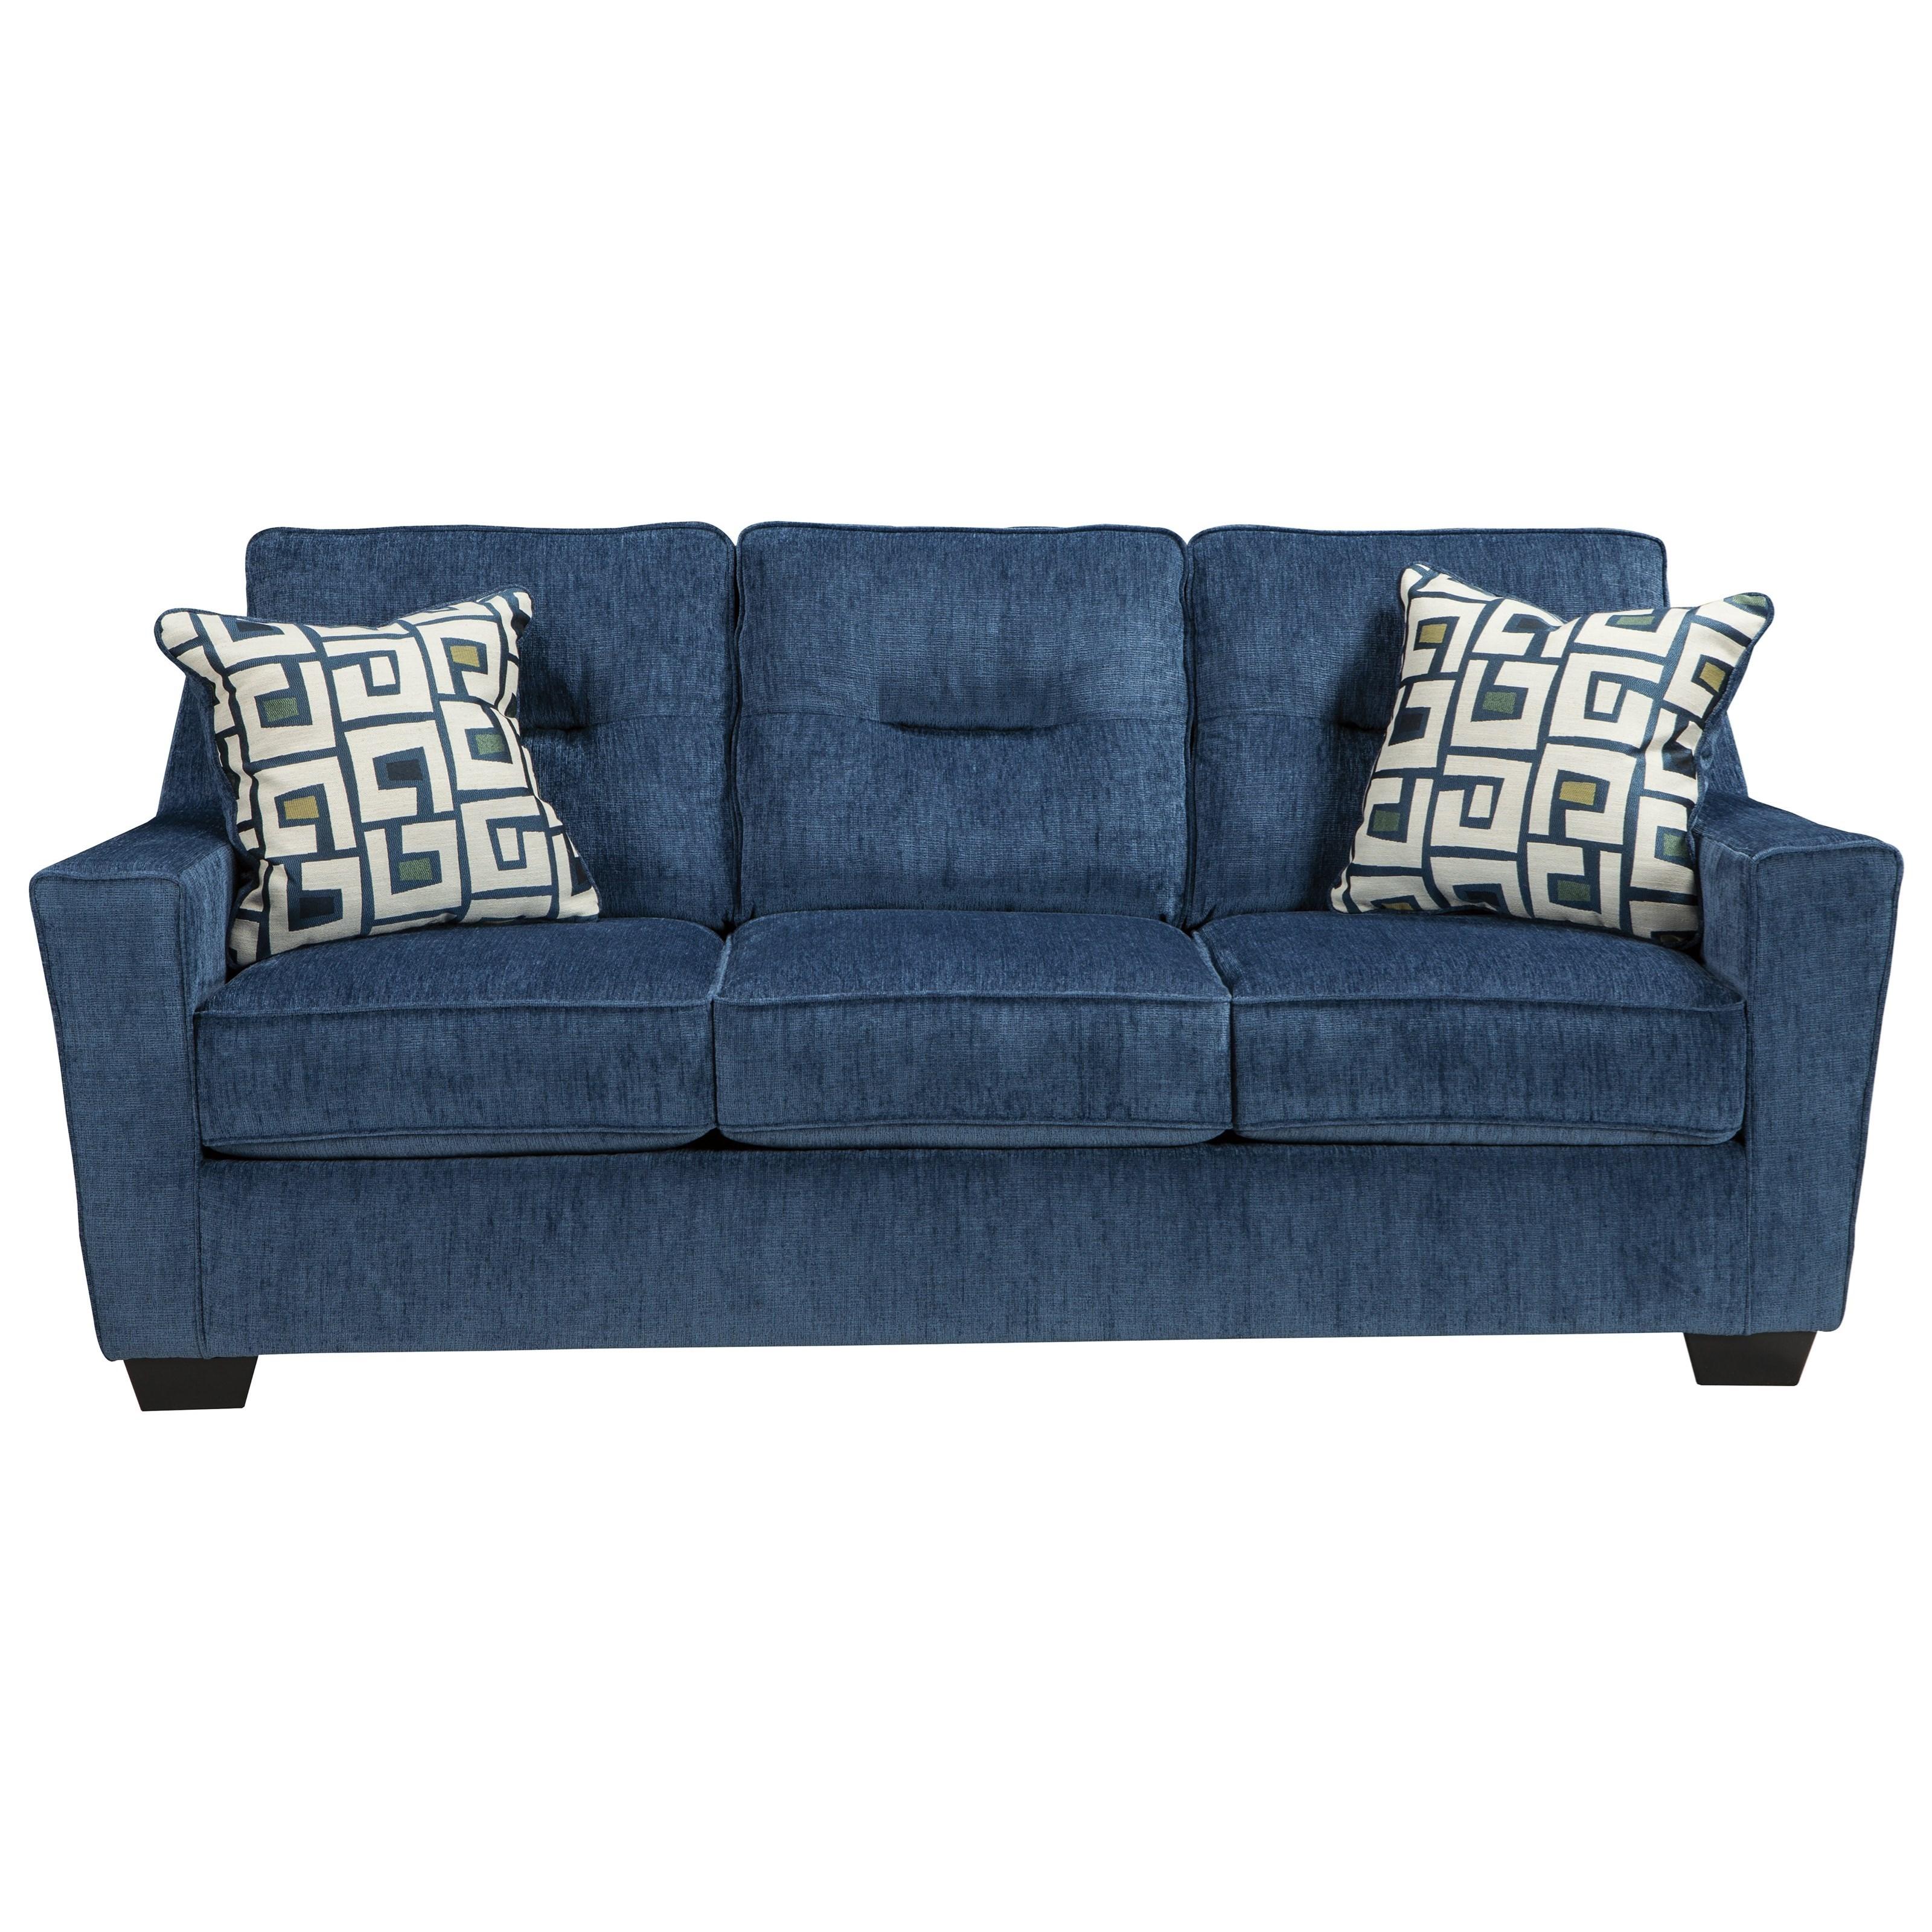 ashley furniture blue sofa aldy sofa pacific ashley furniture home thesofa. Black Bedroom Furniture Sets. Home Design Ideas